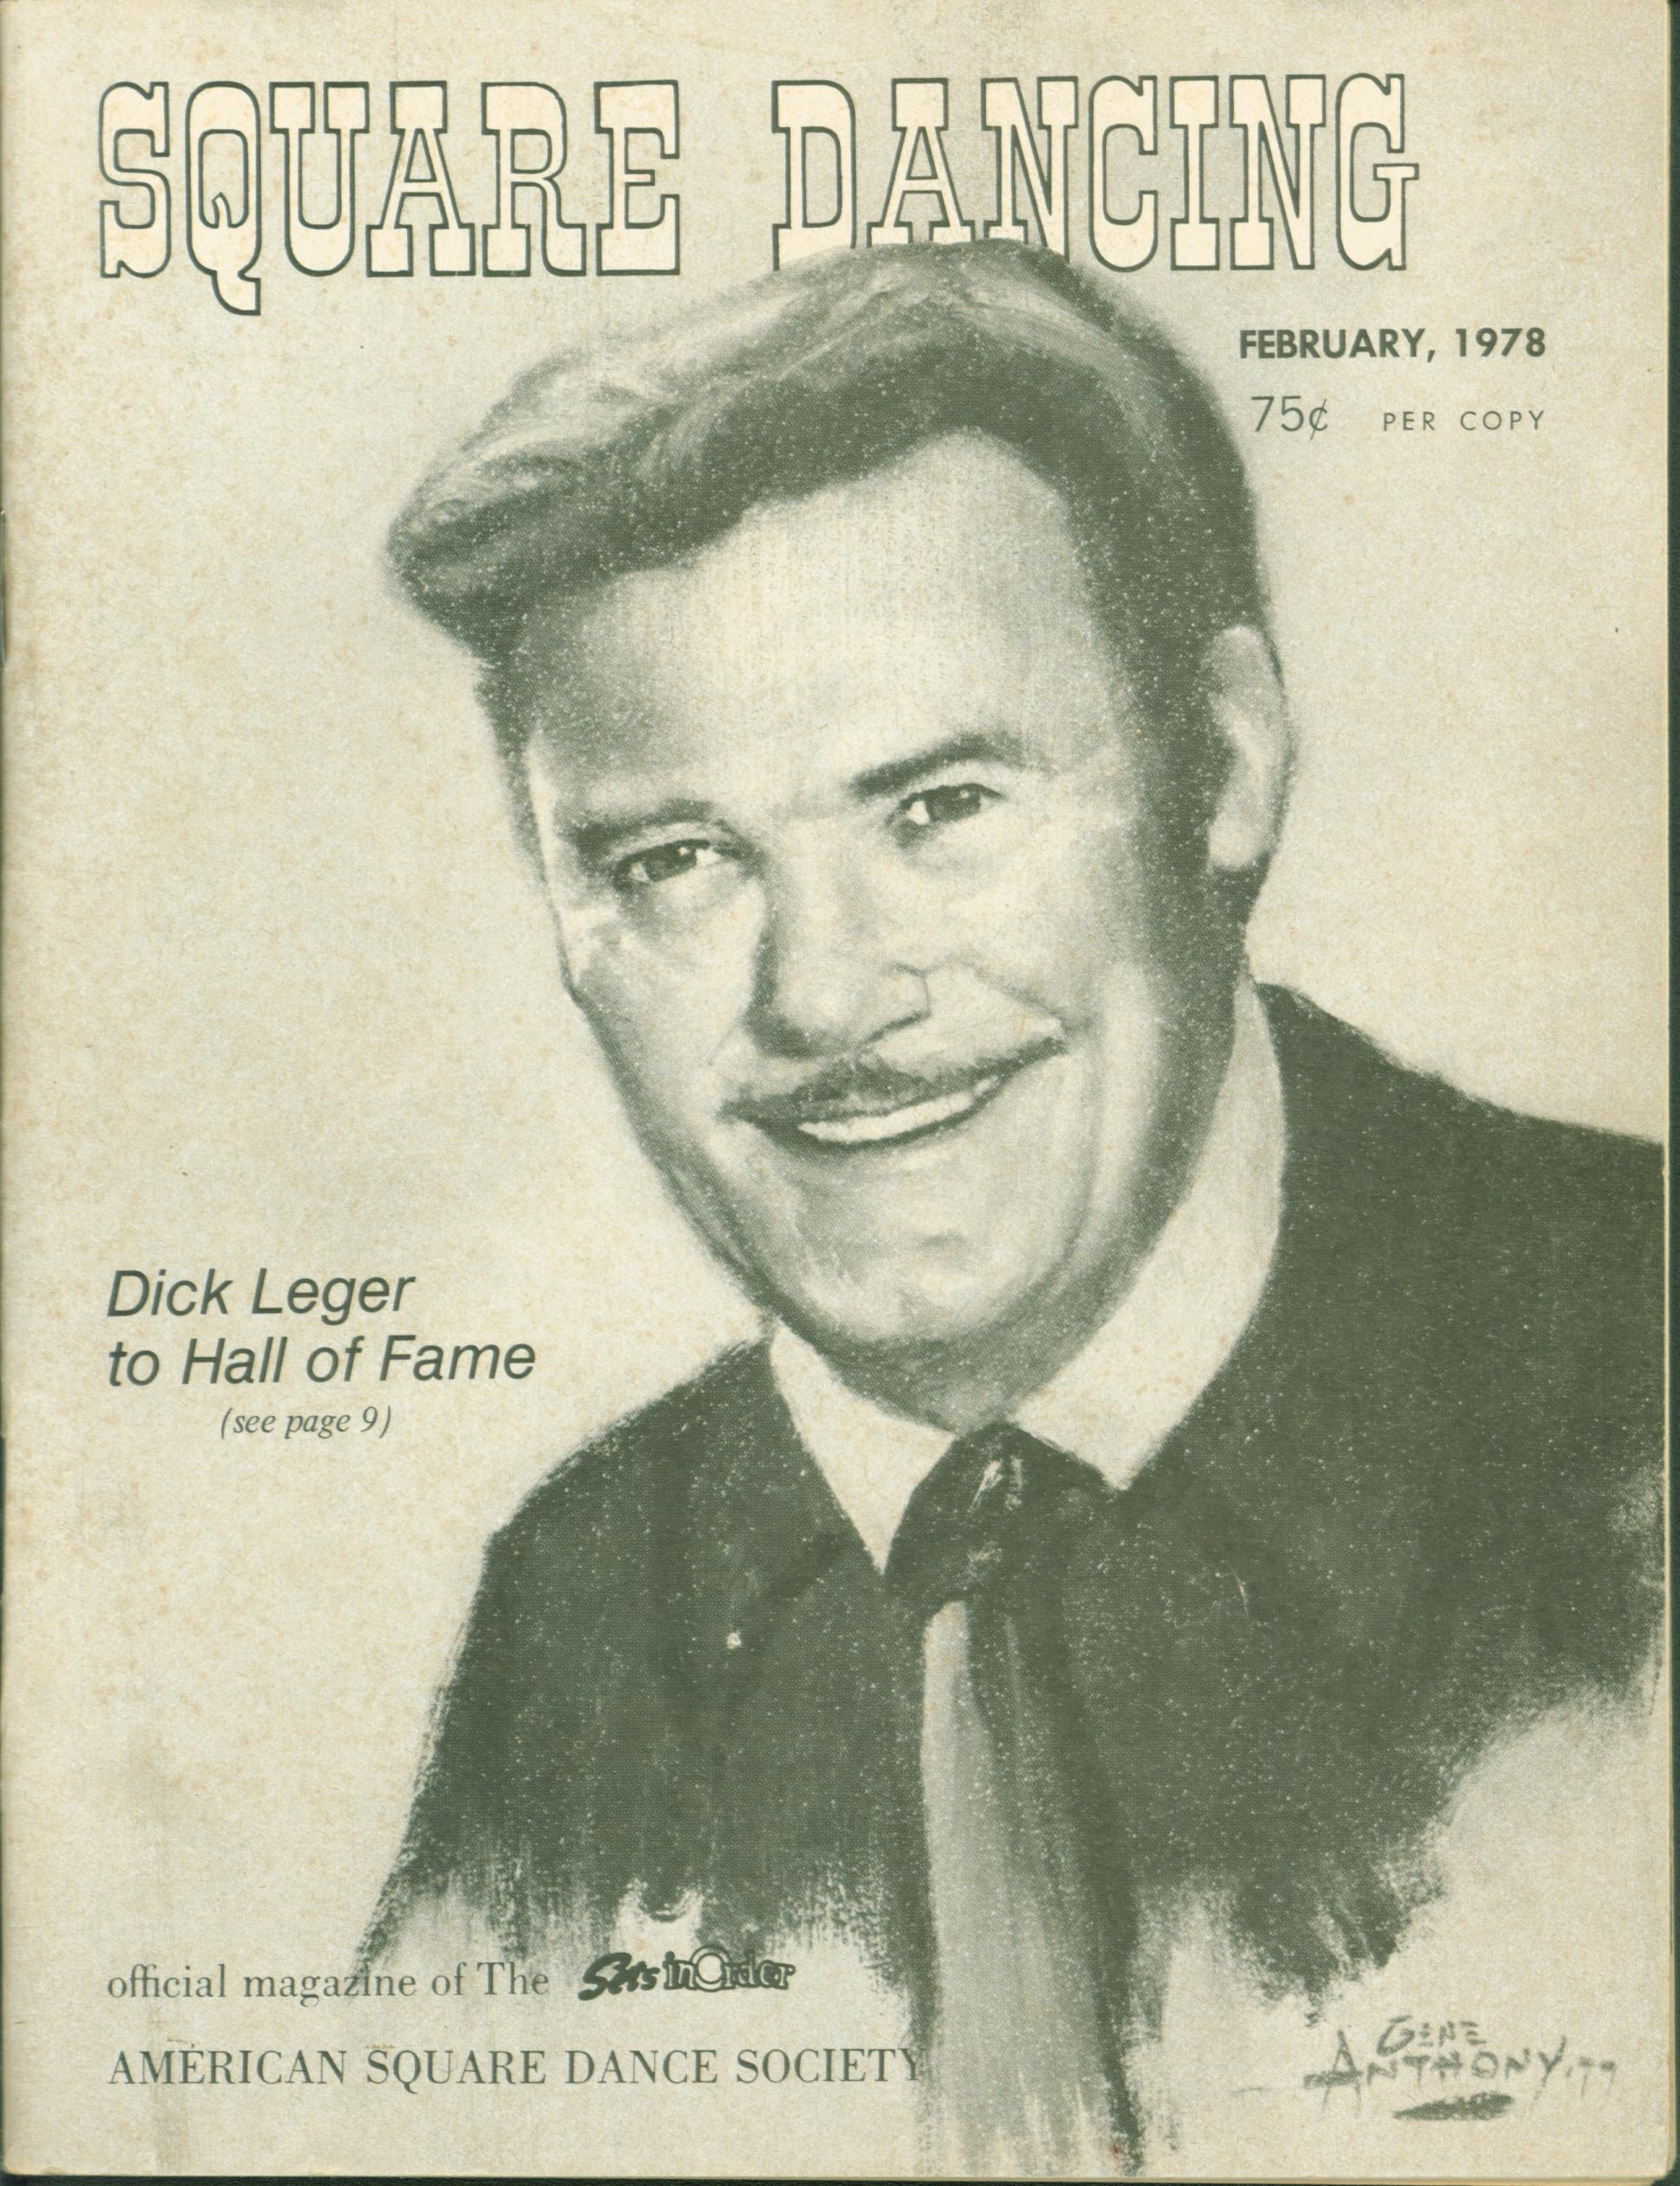 Dick Leger